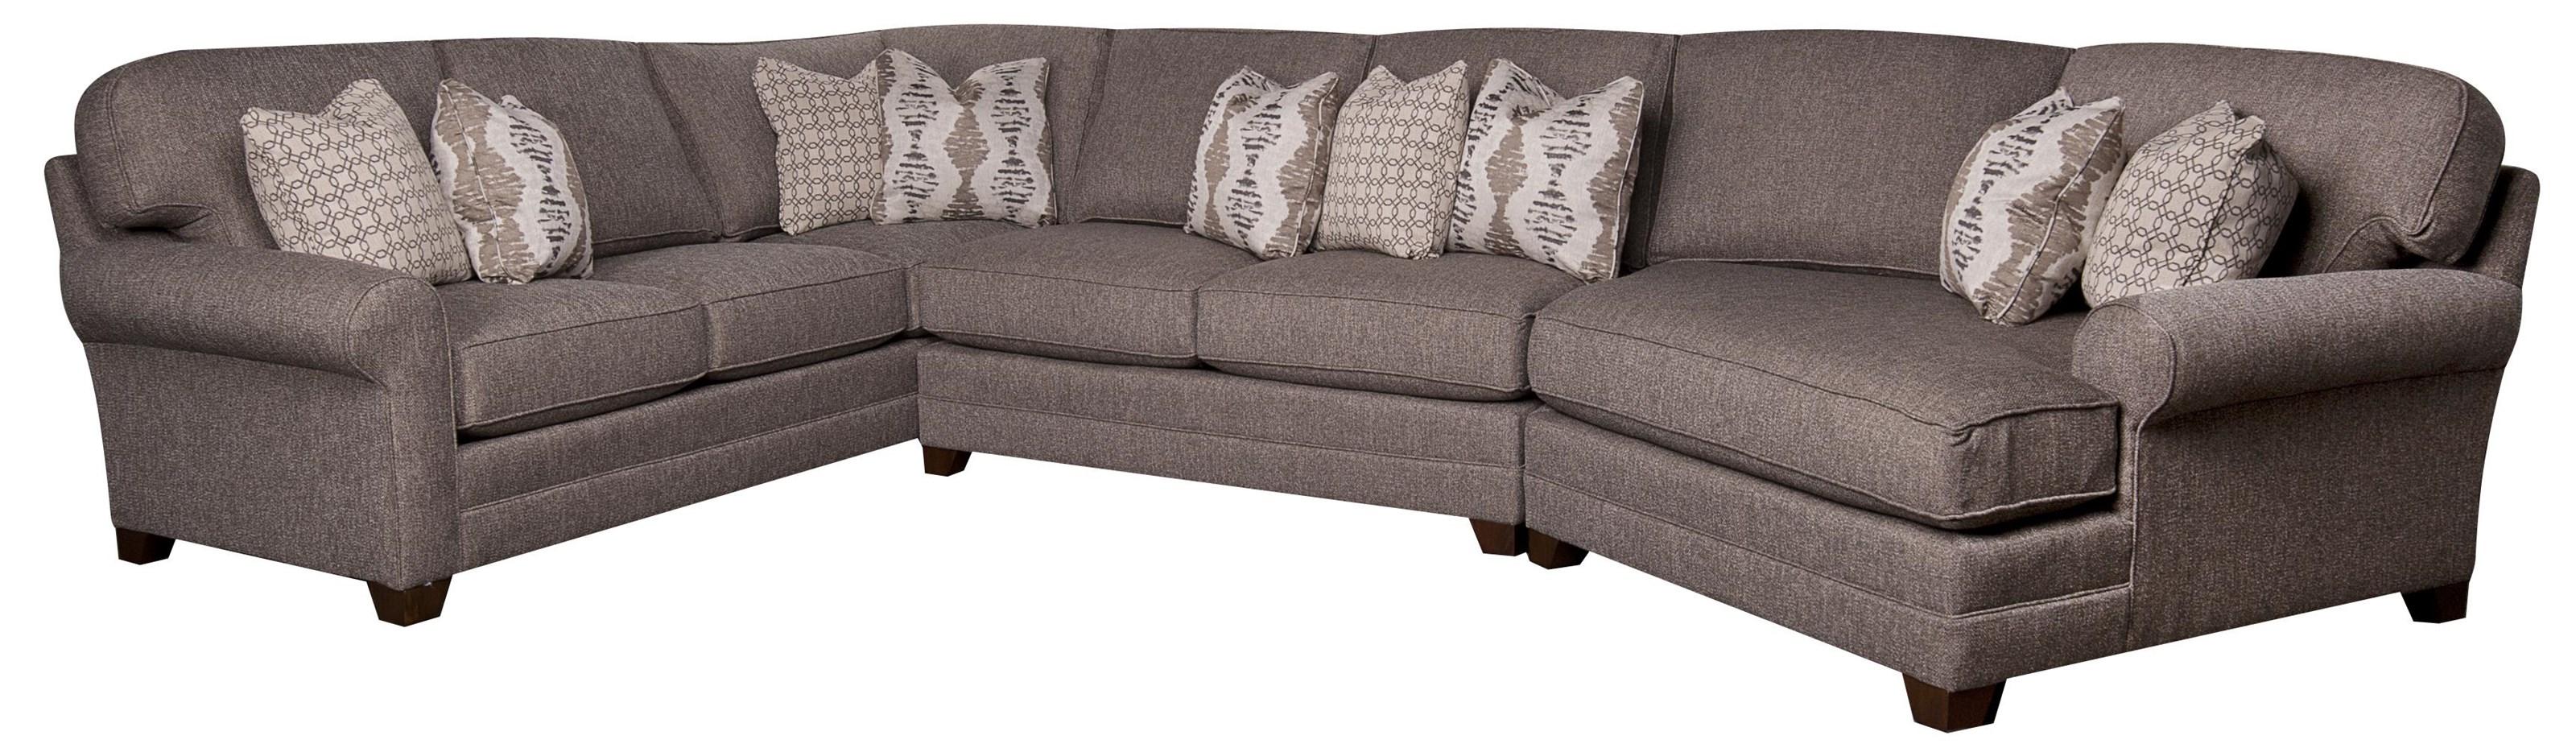 Biltmore McgrawMcgraw Sectional Sofa ...